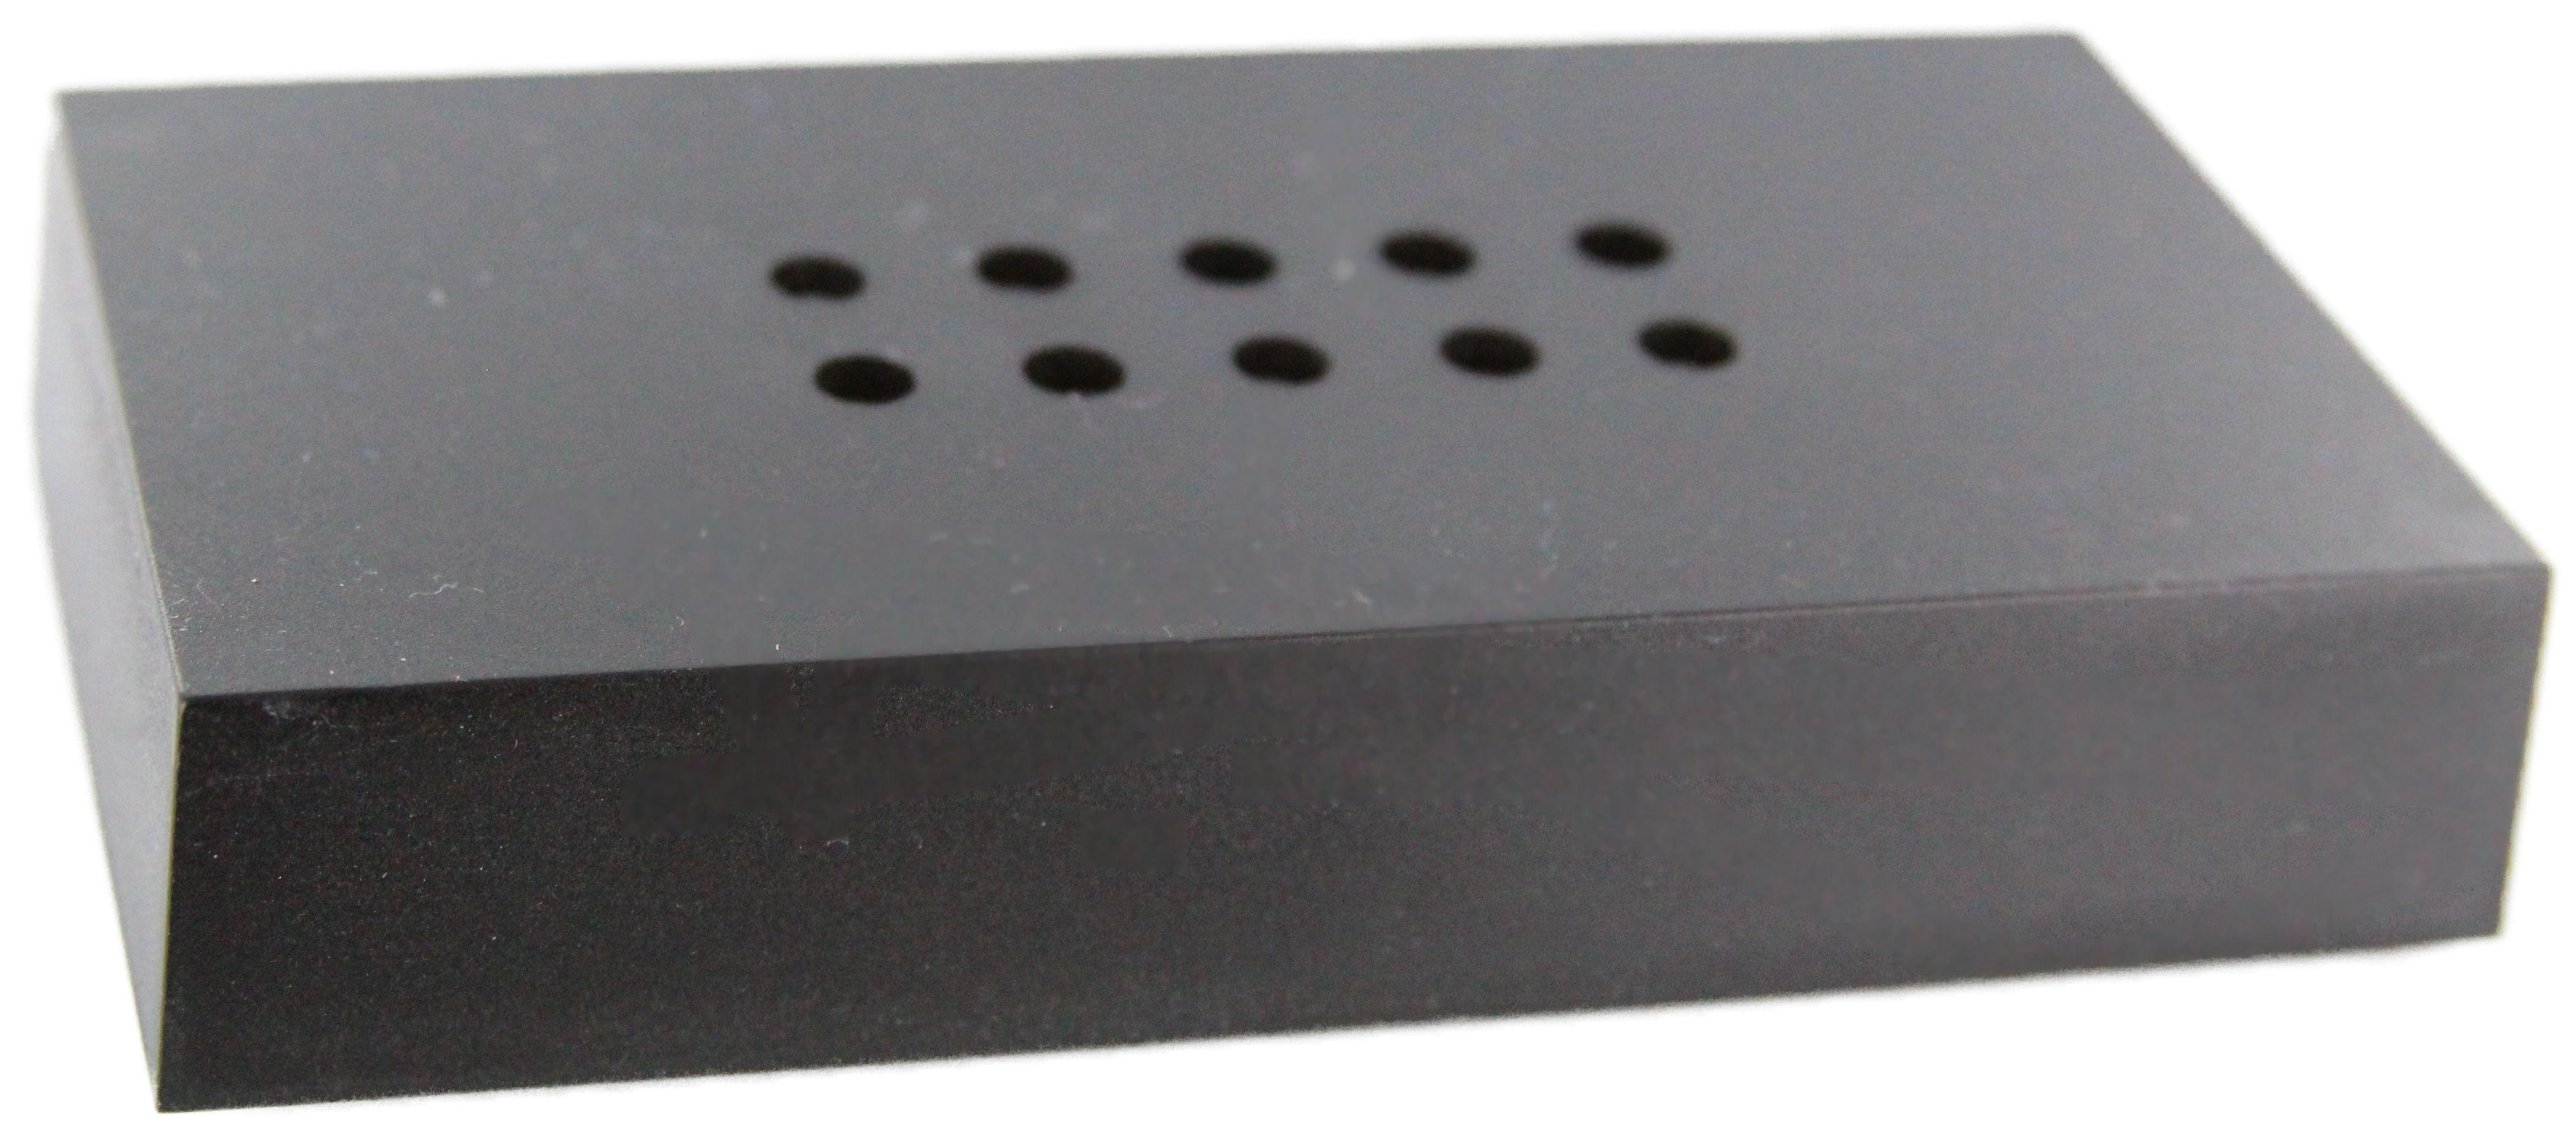 LED LEUCHTSOCKEL   10 weiße LED   100x60x20mm   Farbe Schwarz